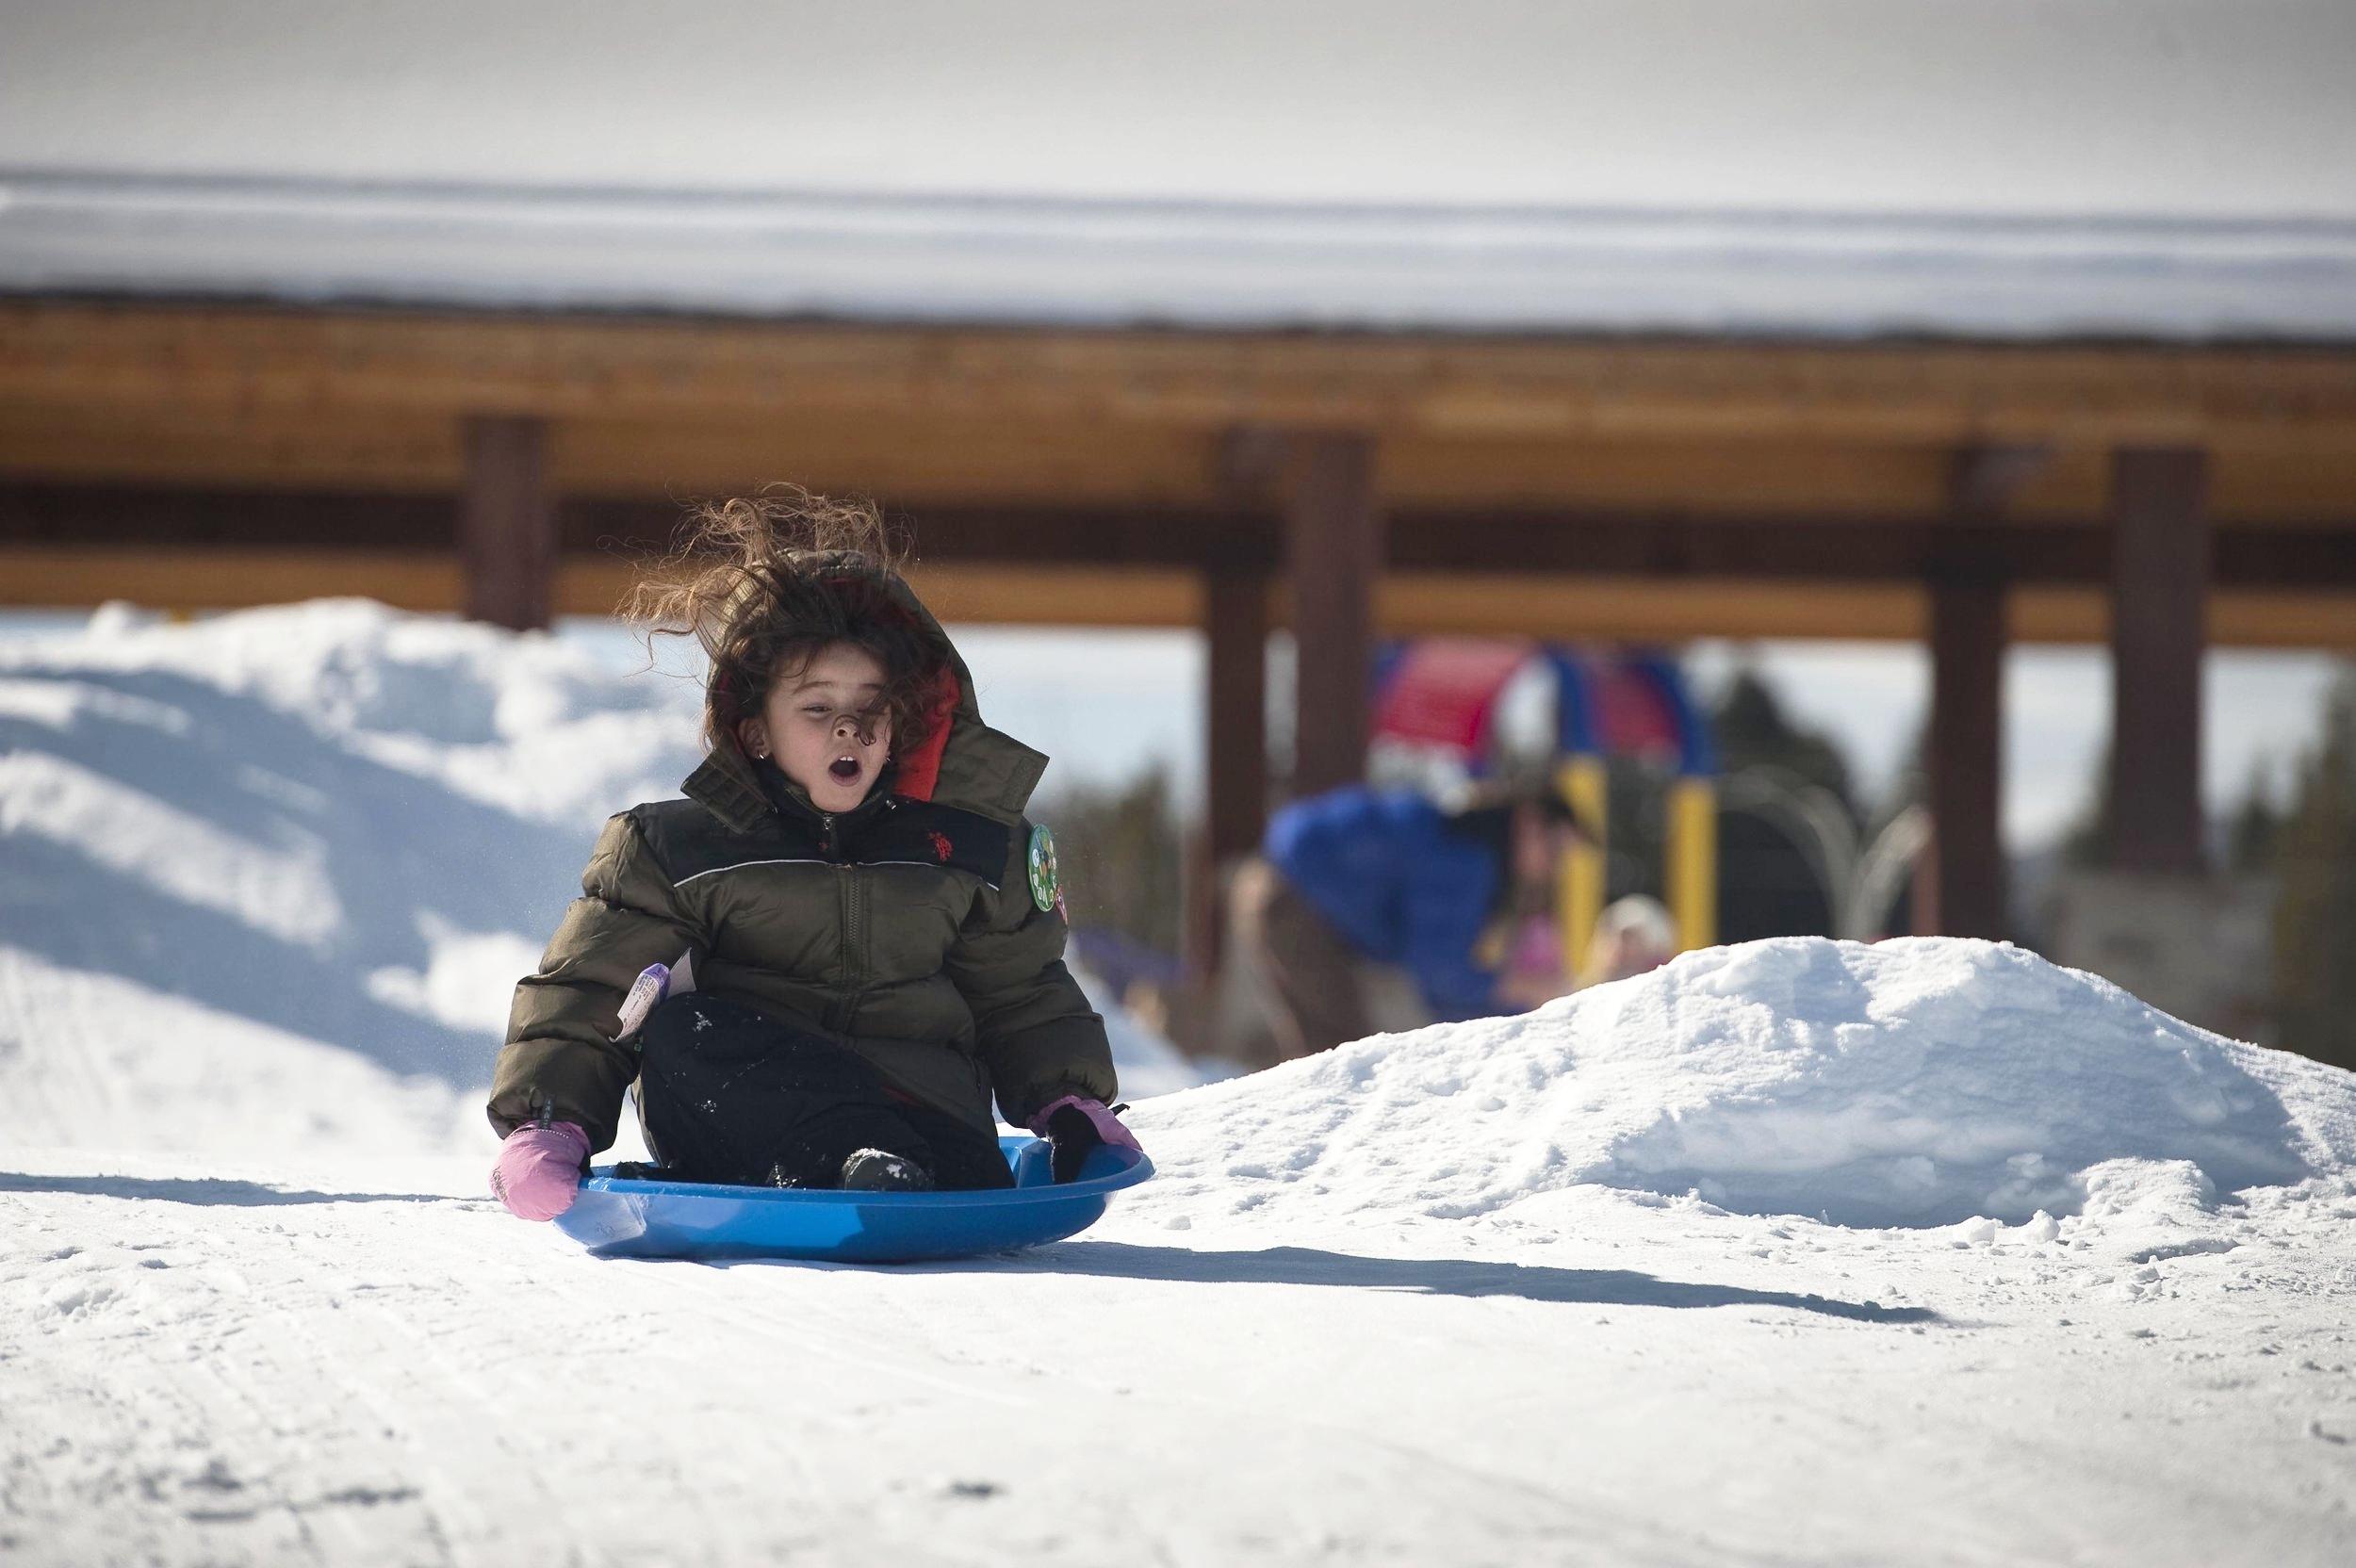 Girl kid on snow sledding hill in winter park hideaway concert festival venue amphitheater